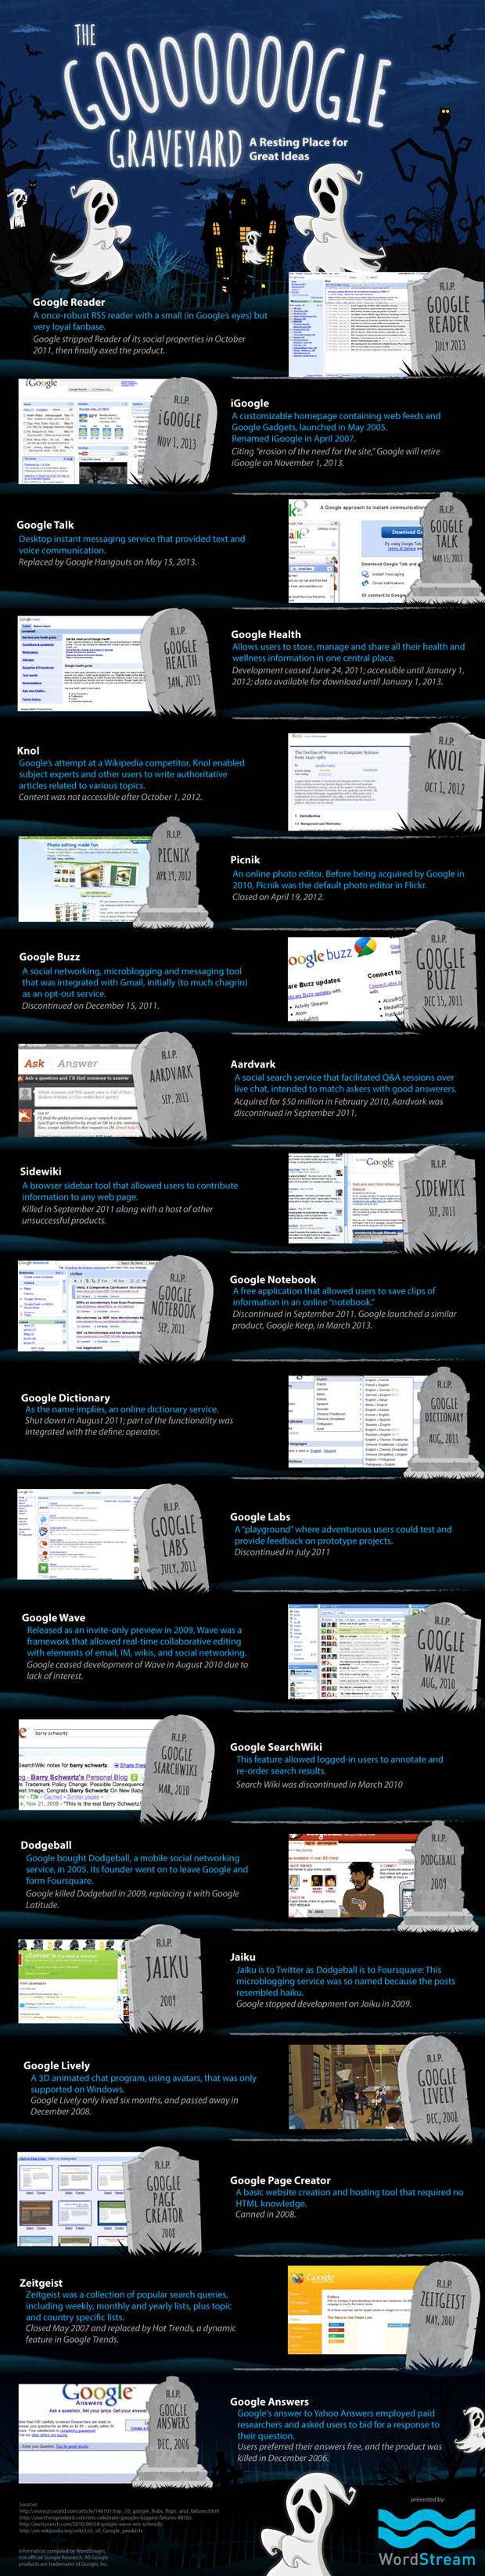 google-services-killed